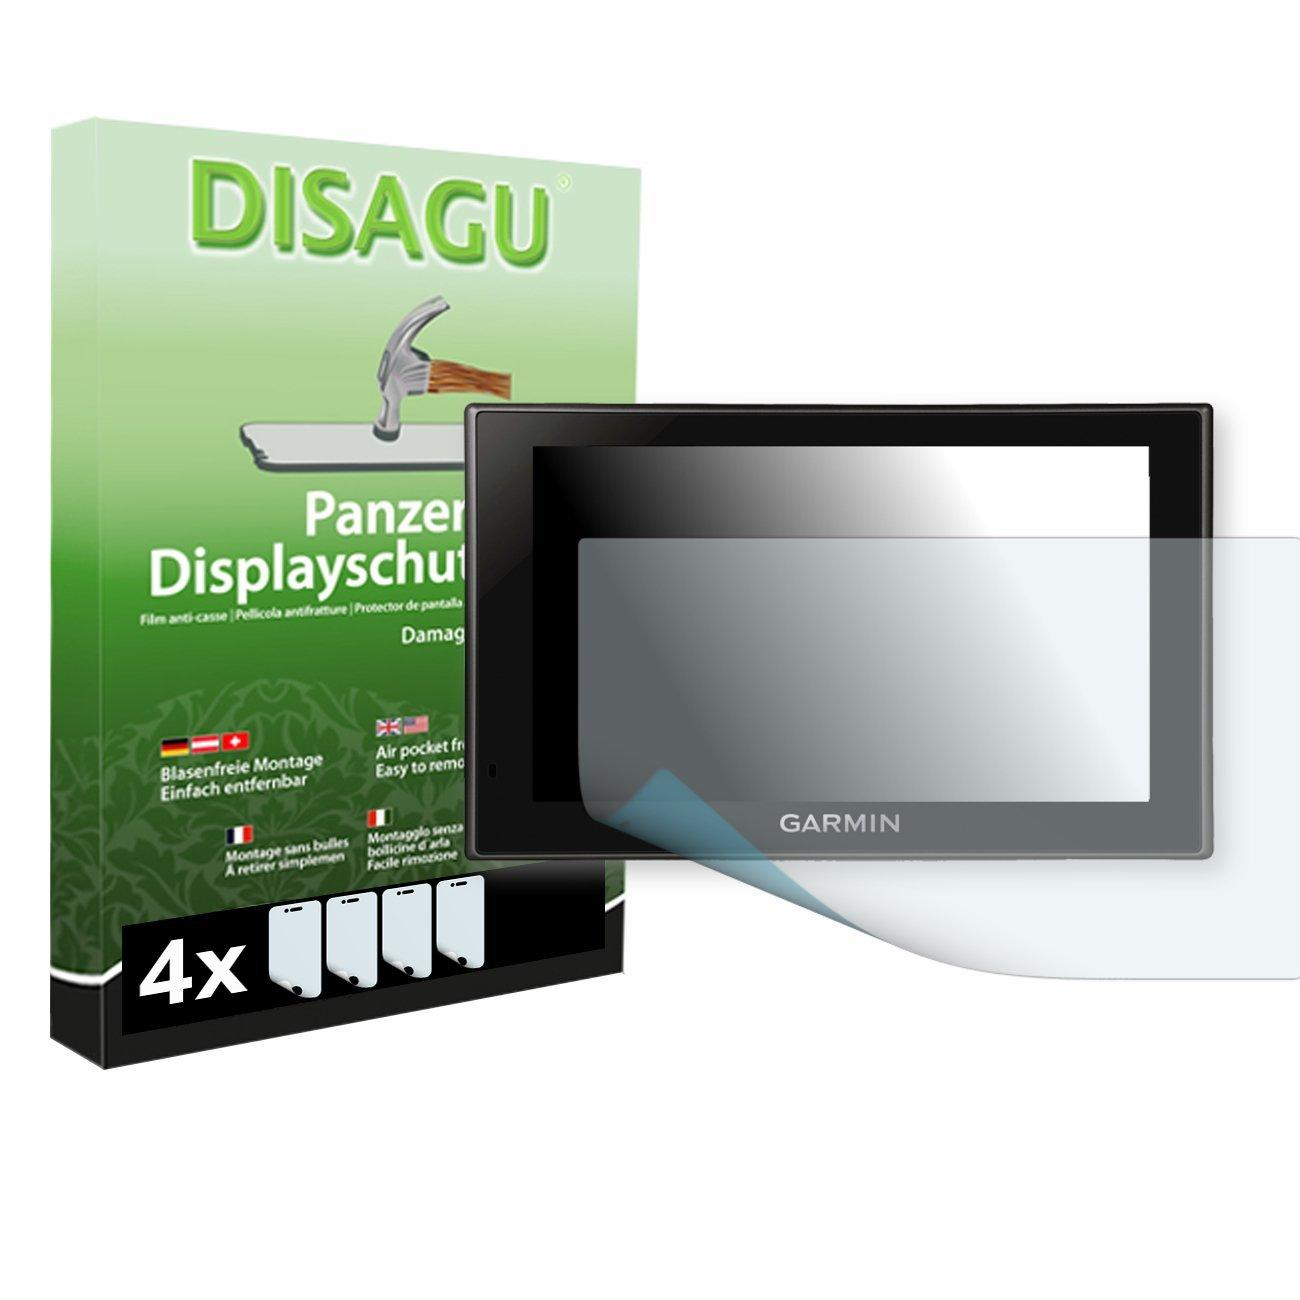 4 x DISAGU Armor screen protector for Garmin Camper 660 LMT screen fracture protection film